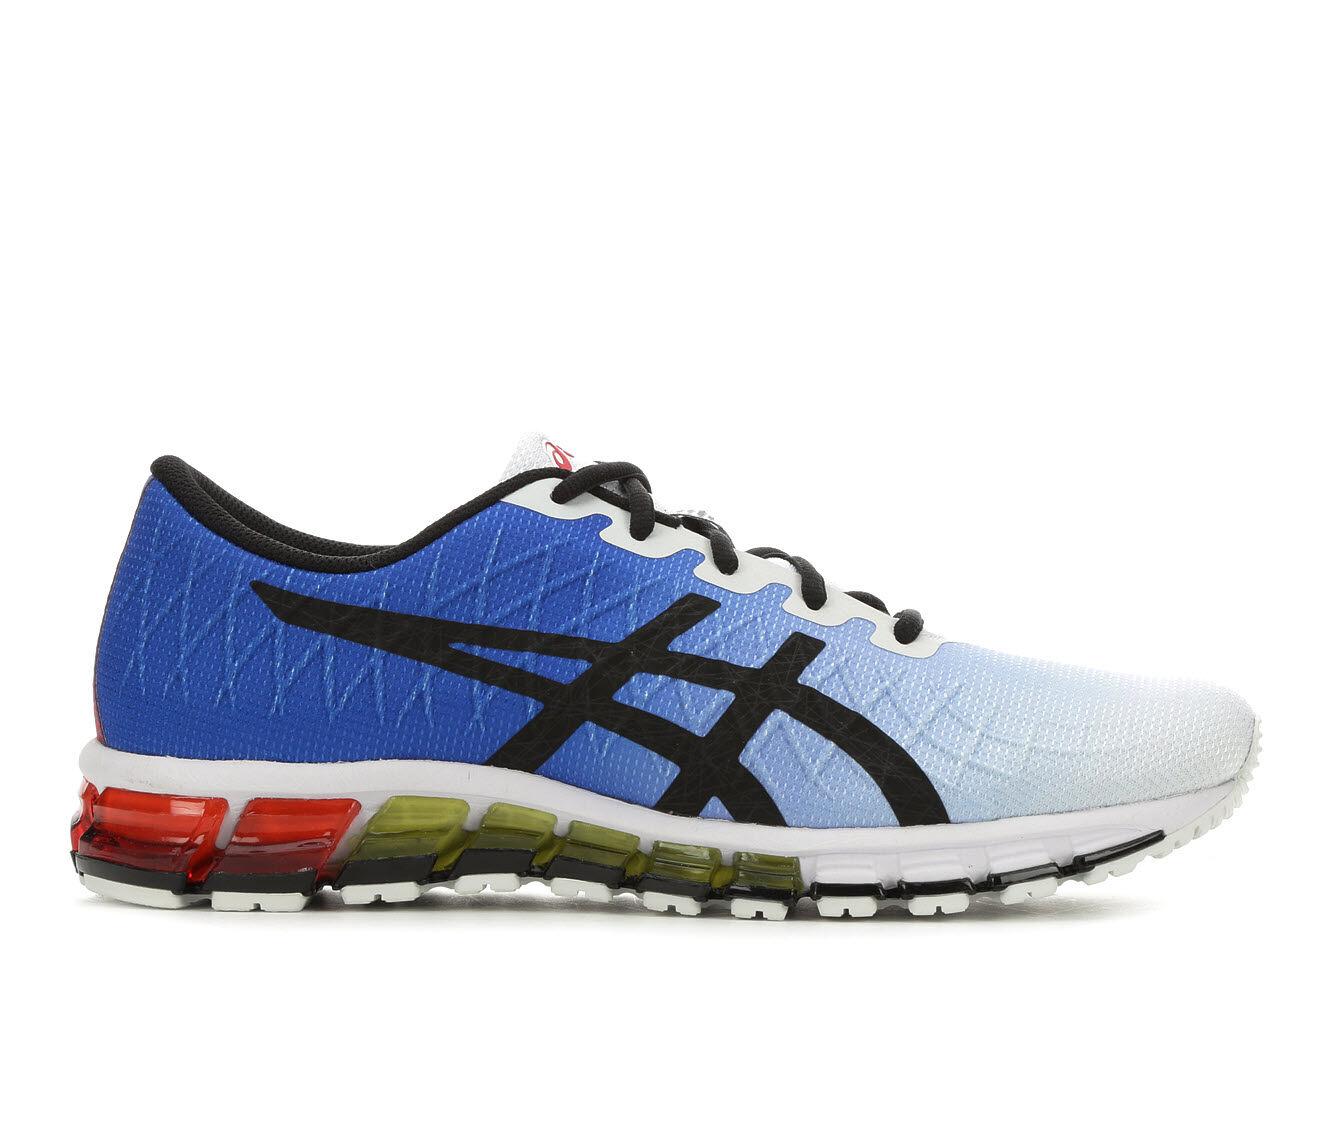 Men's ASICS Gel Quantum 180 4 - M Running Shoes Blu/Wht/Bk